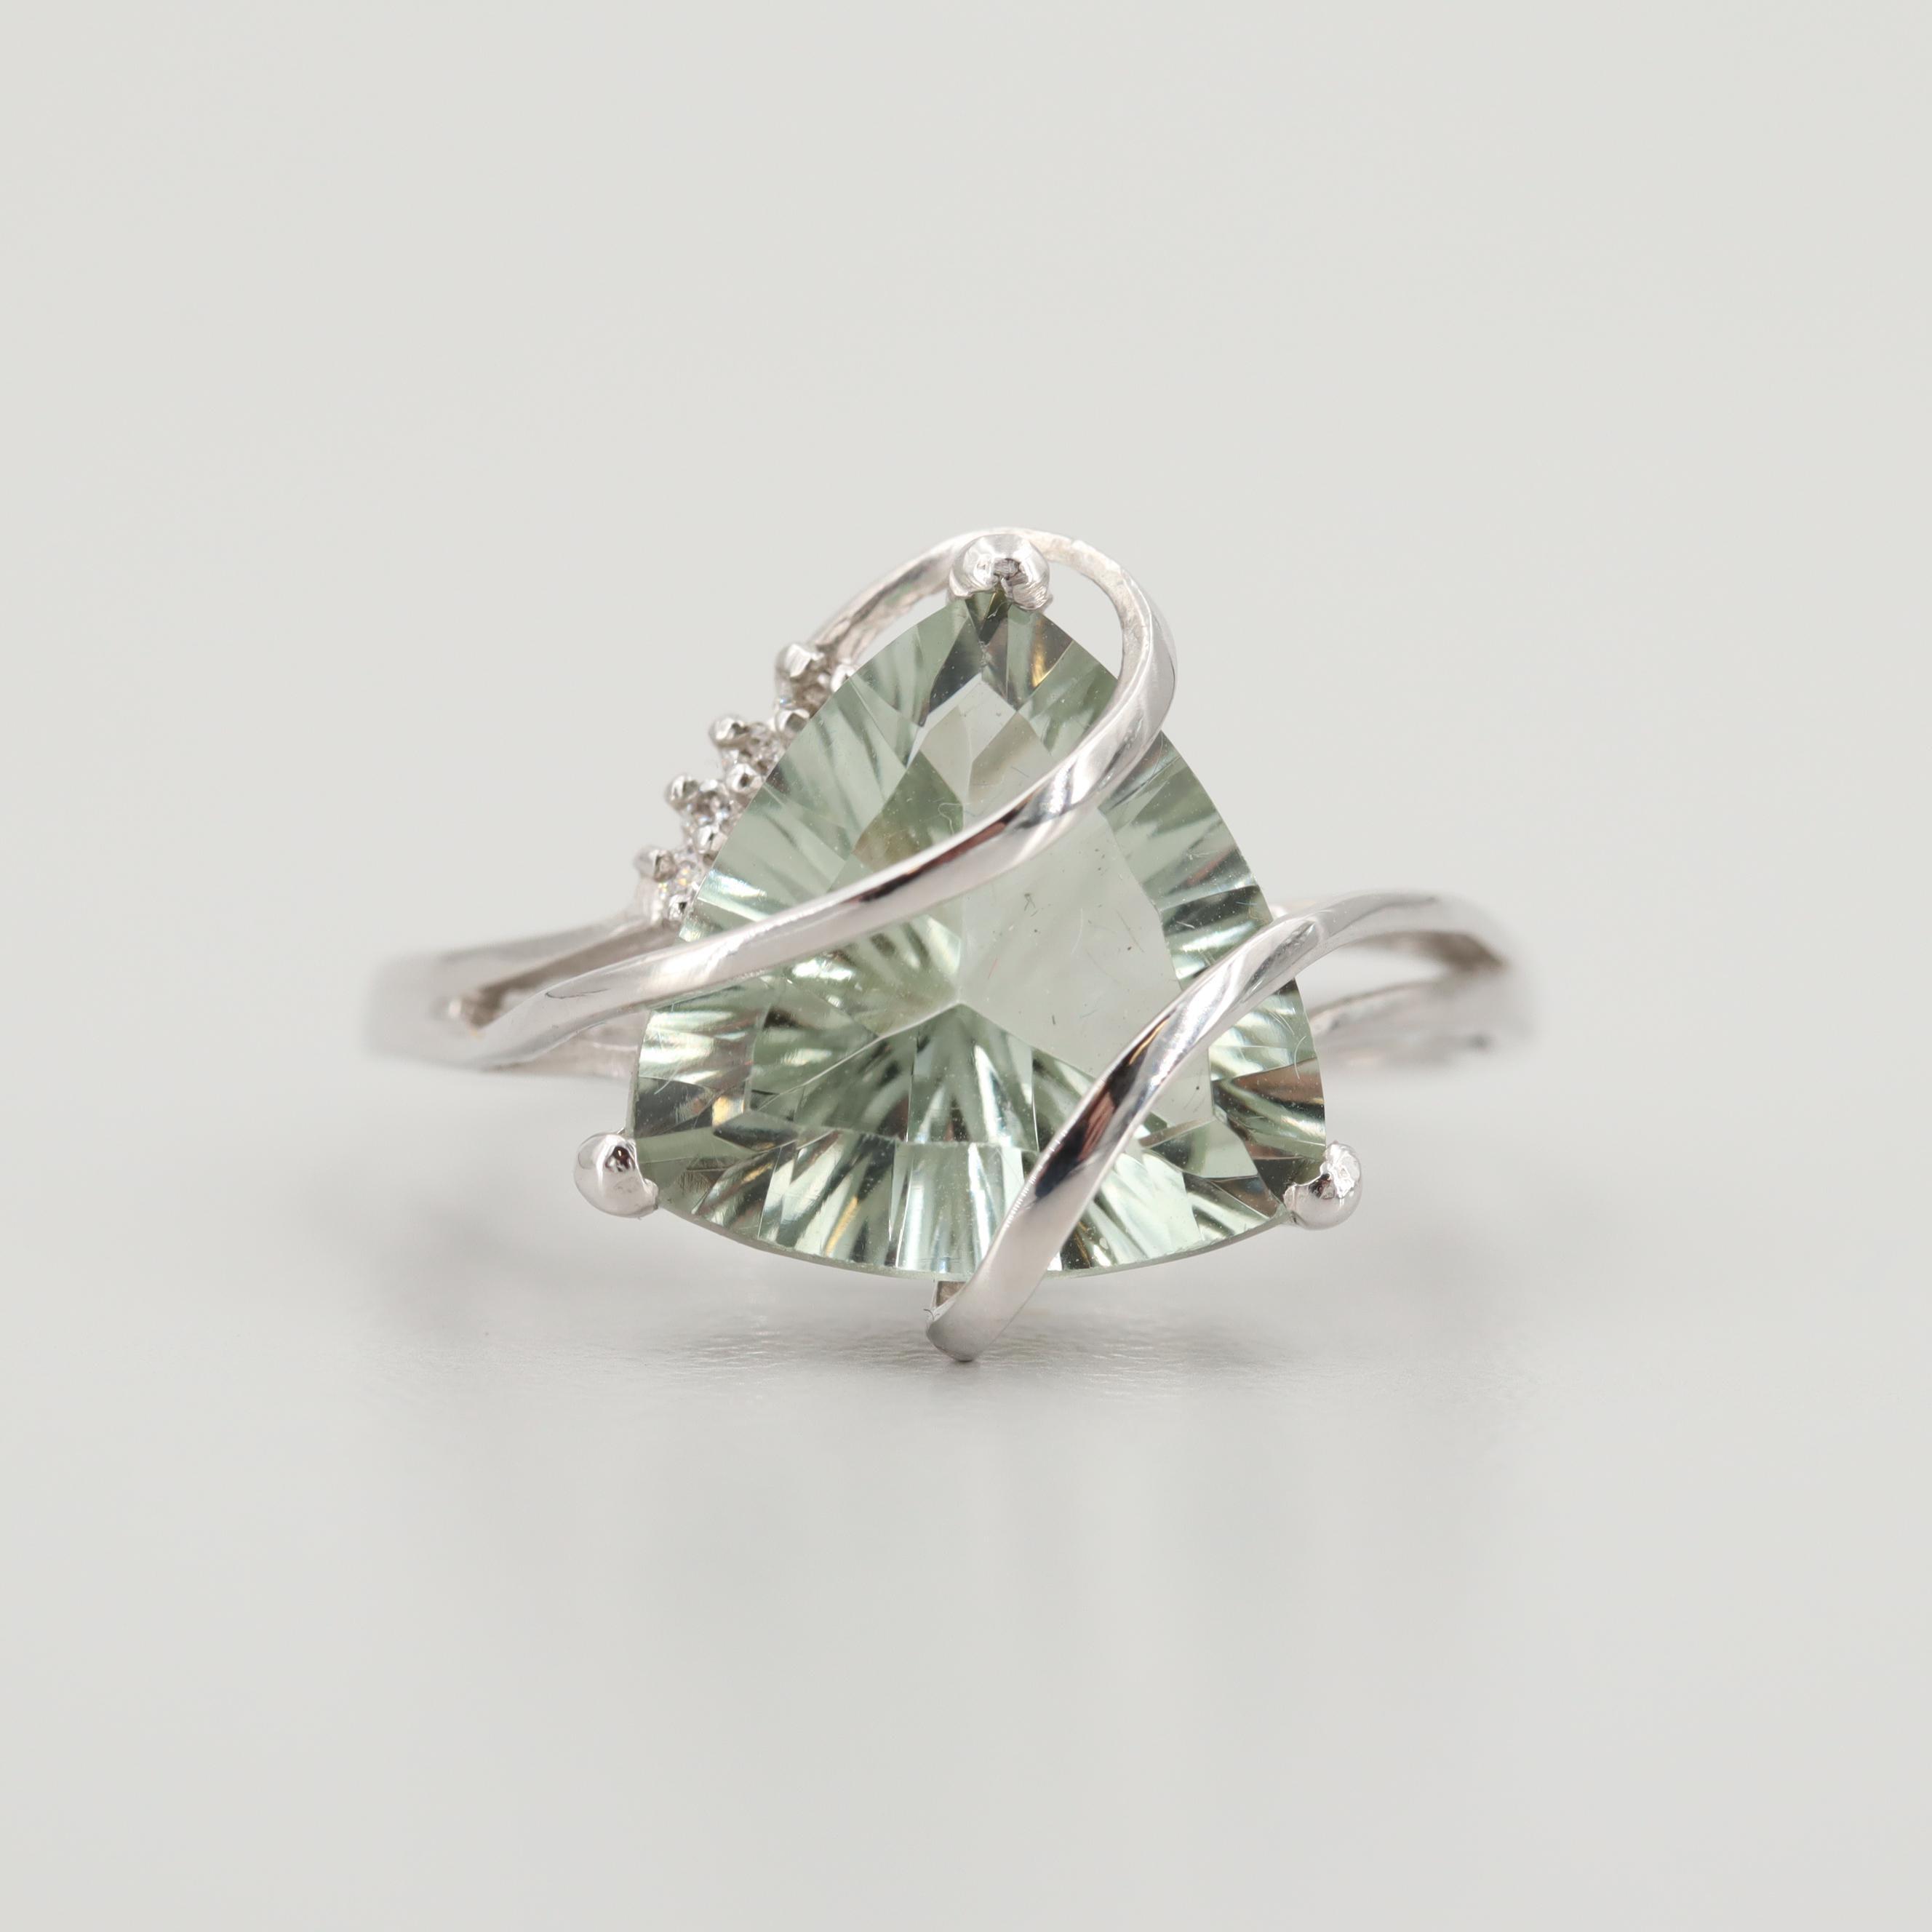 14K White Gold Prasiolite and Diamond Rings